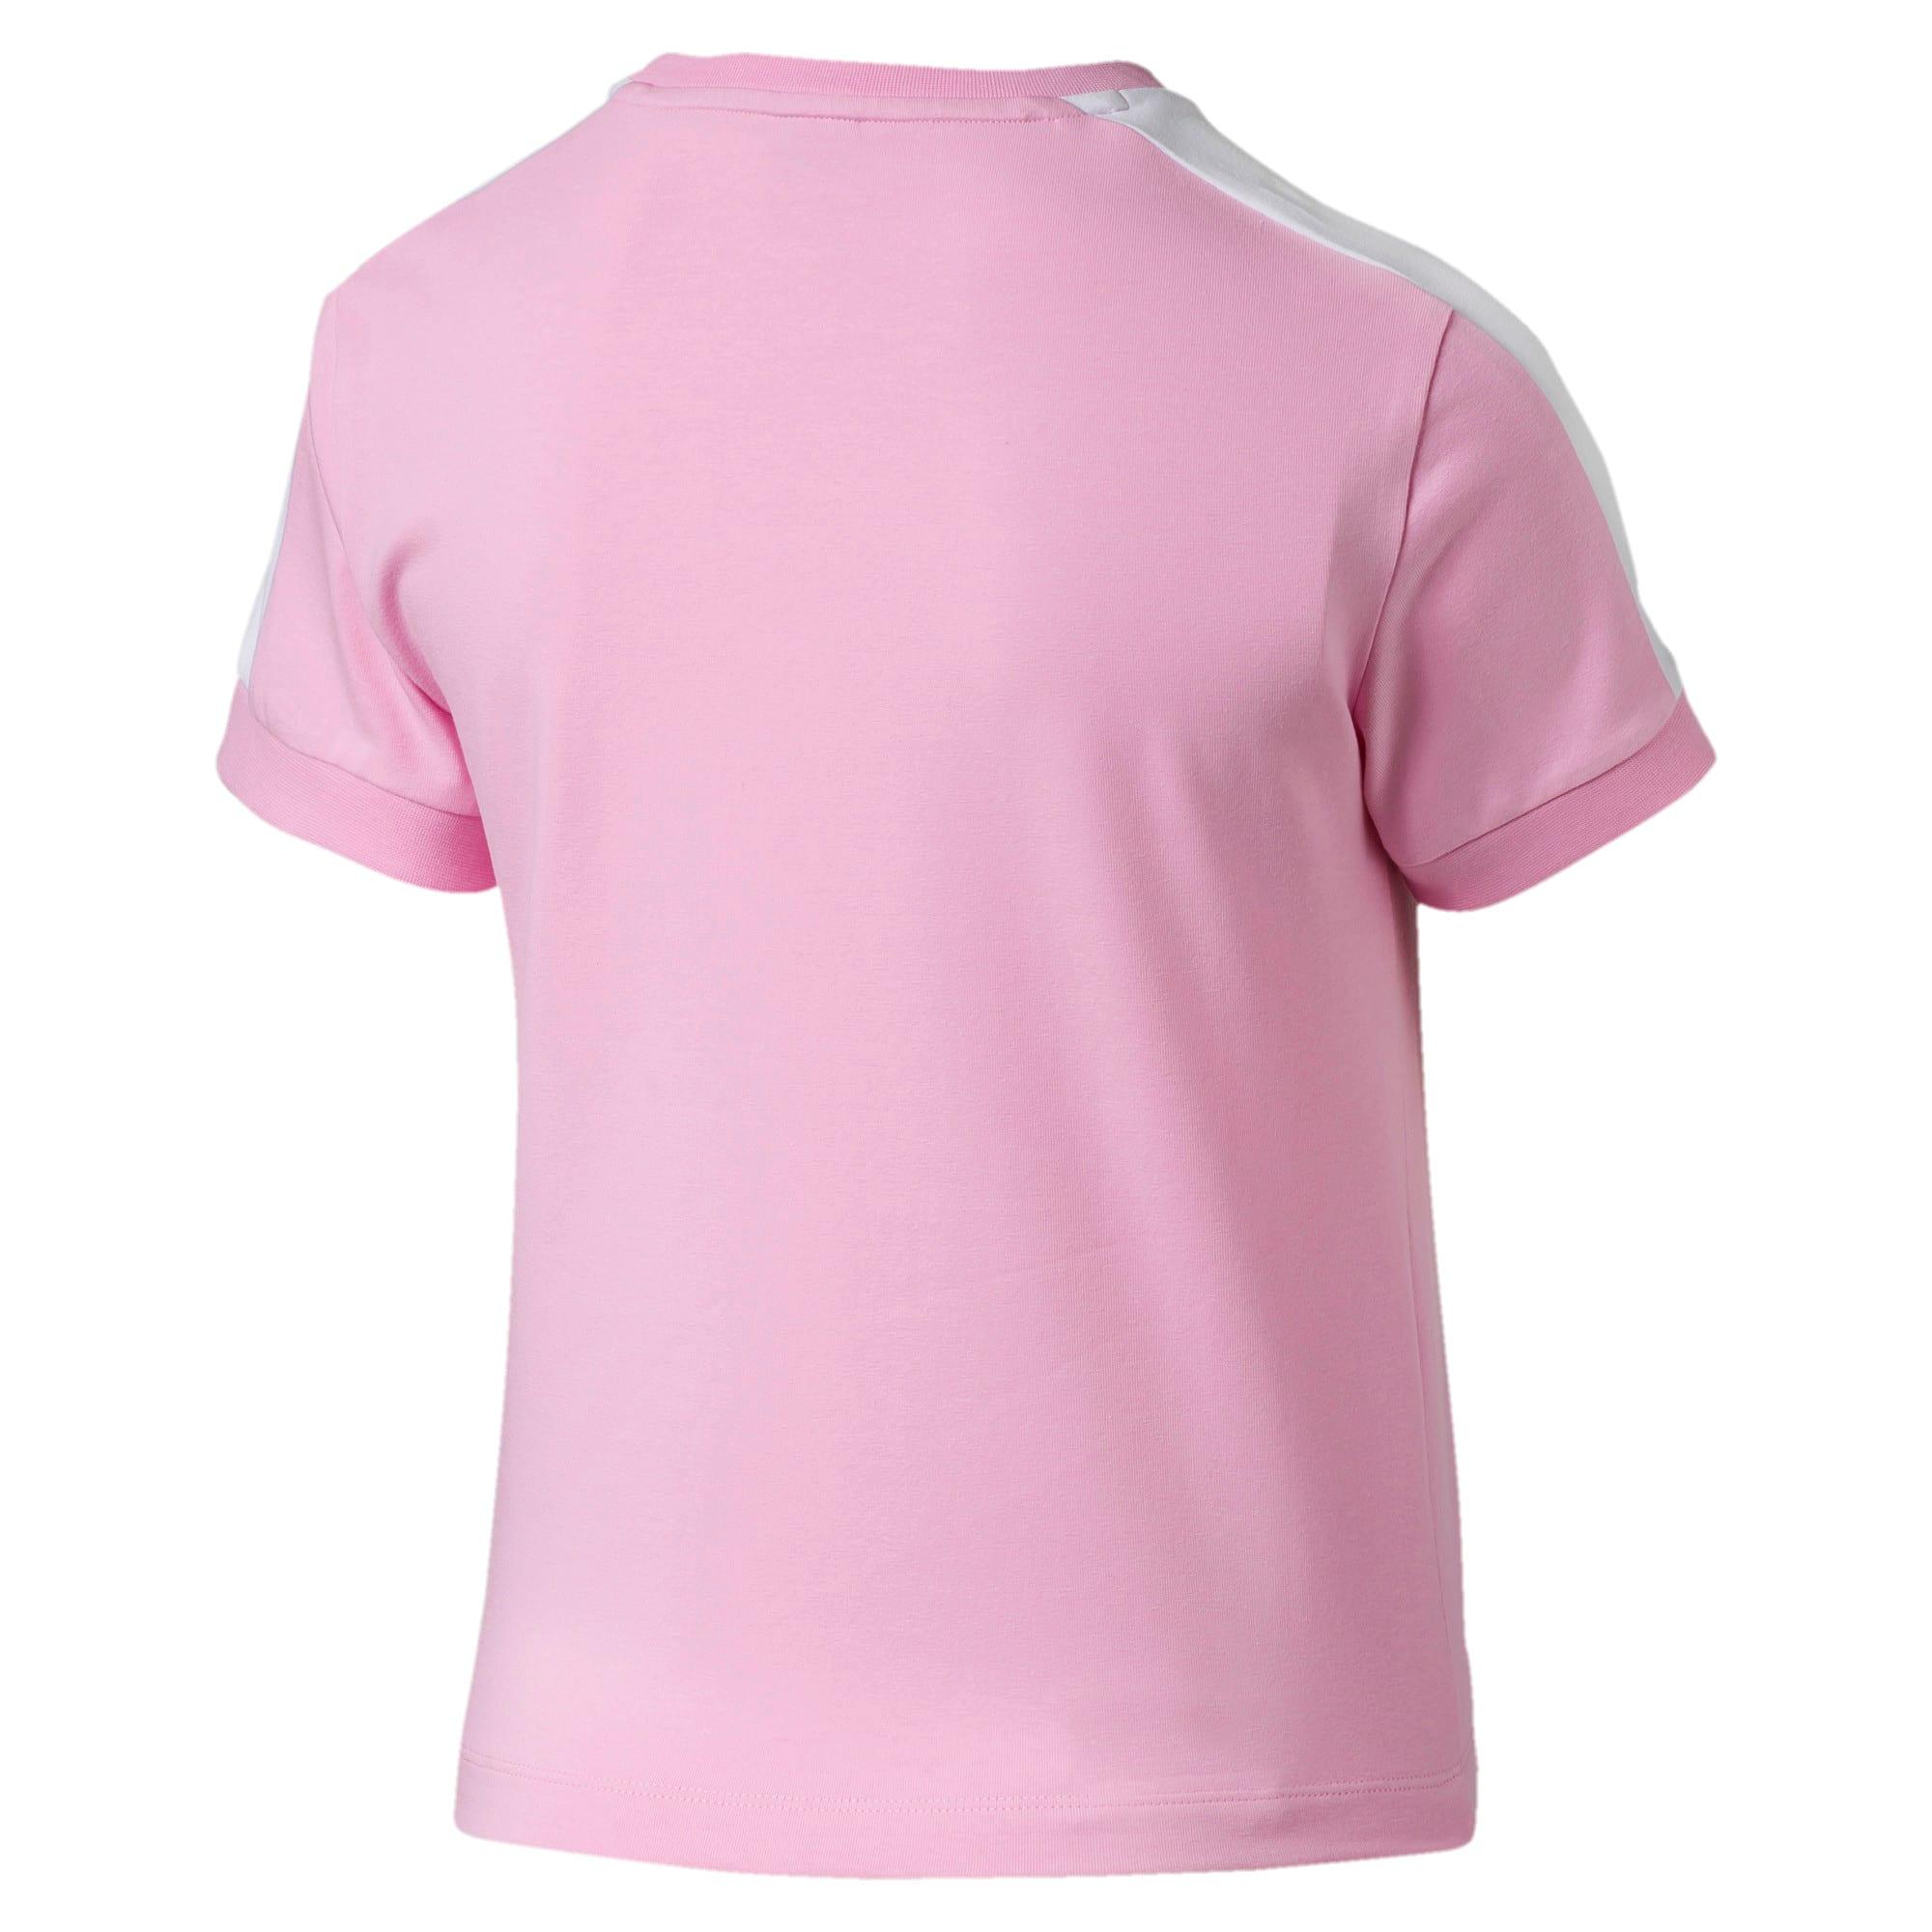 Thumbnail 2 of CLASSICS タイト ウィメンズ SS Tシャツ 半袖, Pale Pink, medium-JPN